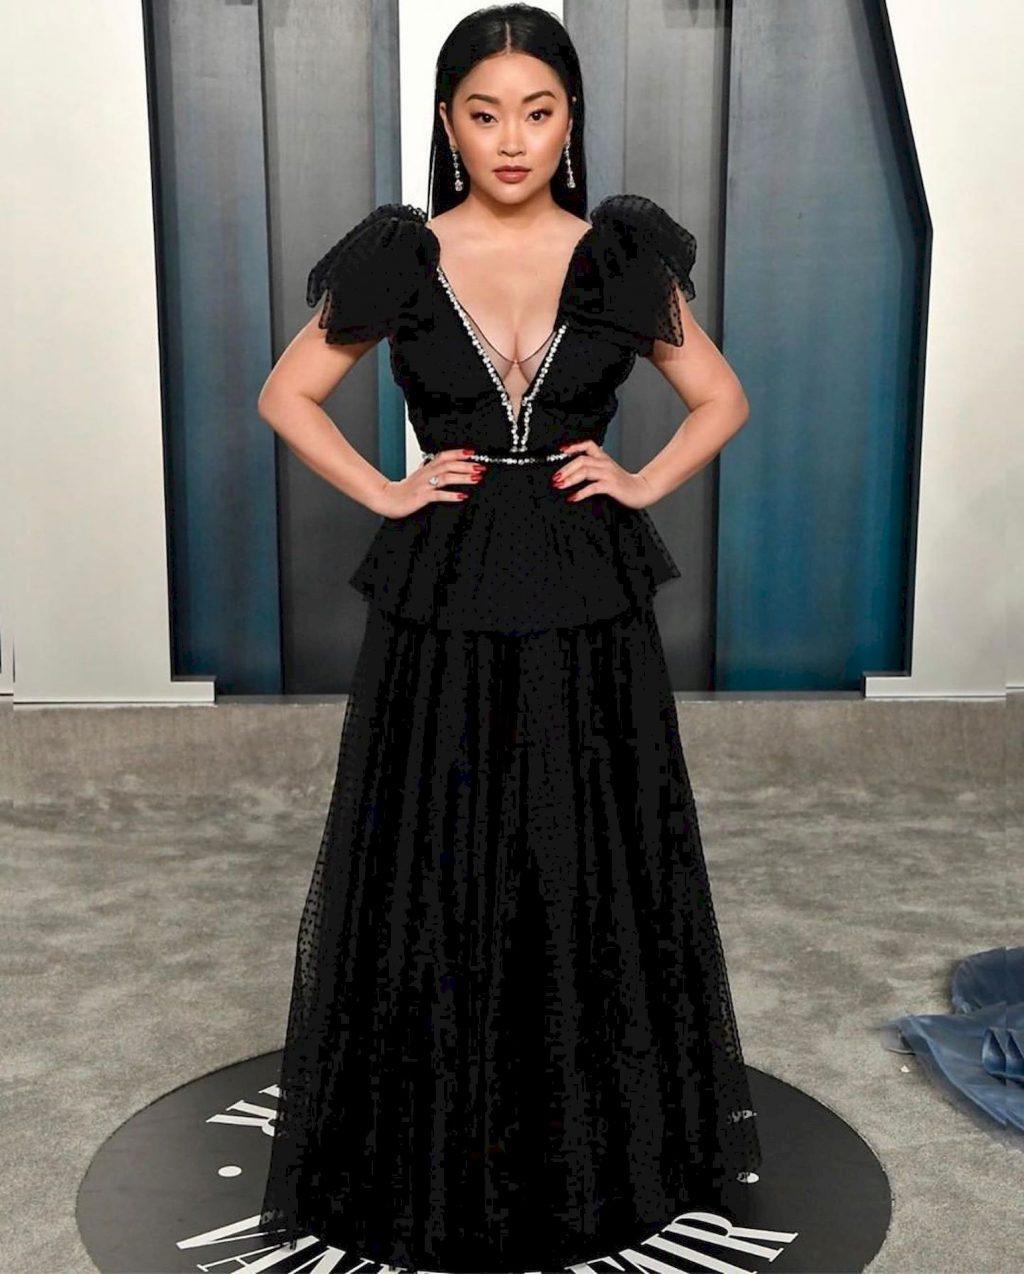 Lana Condor Displays Her Tits at the Vanity Fair Oscar Party (22 Photos)